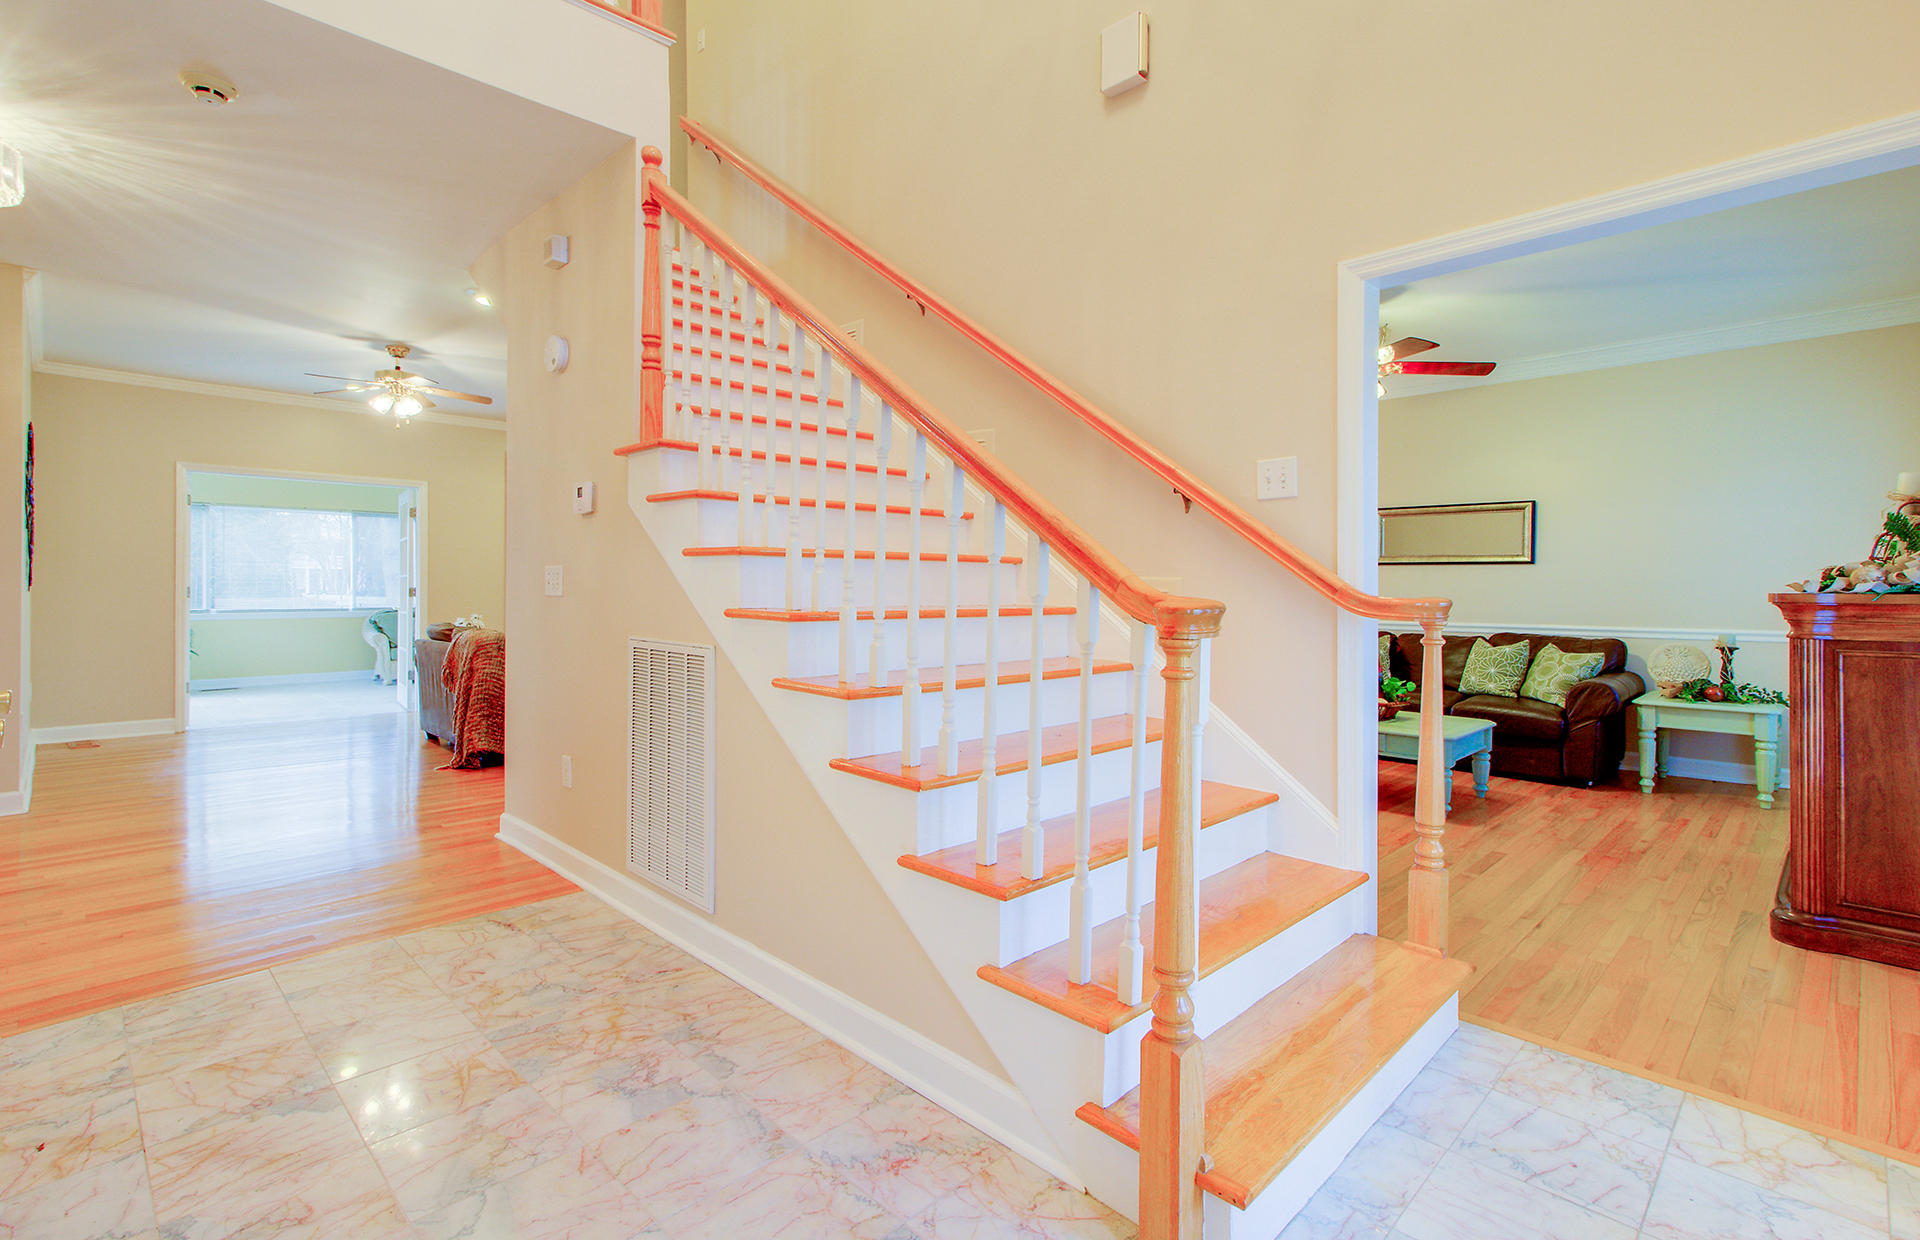 Bakers Landing Homes For Sale - 105 River Oak, North Charleston, SC - 10